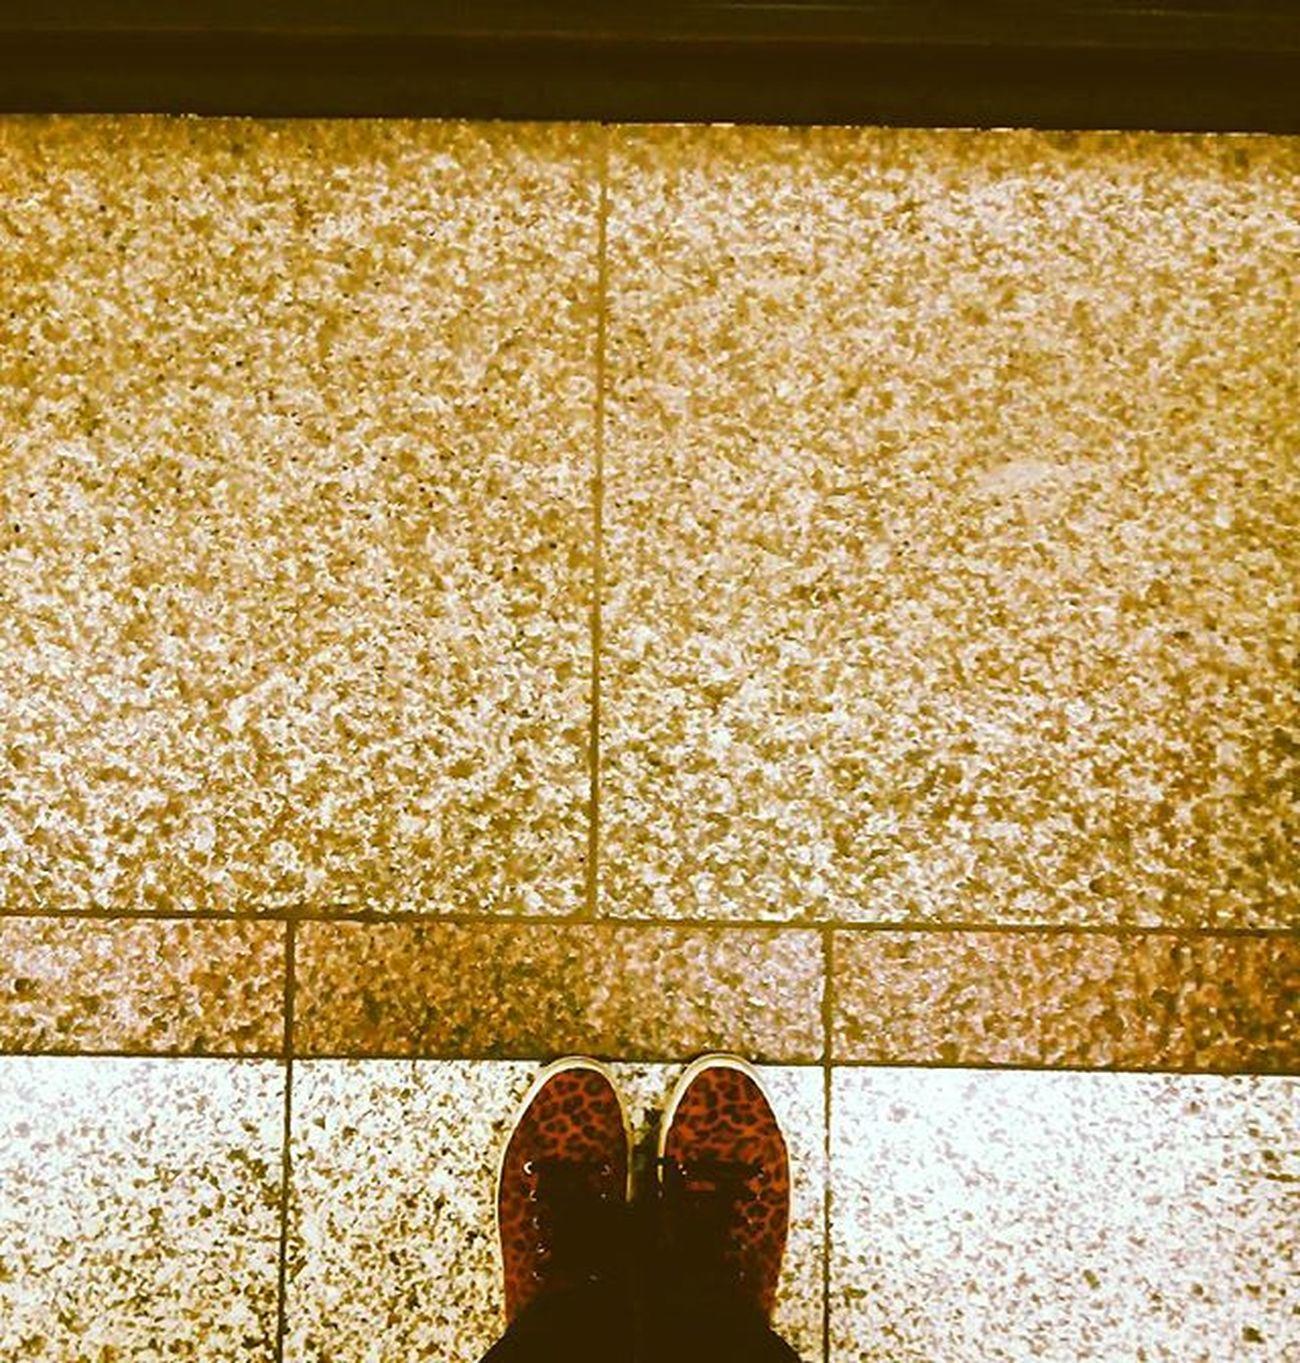 Animal print.•°•{January 29th} αθηνούλα μέγαρομουσικής Metrostation Shoes Floor Animalprint Fridays Fridaymood Rehearsing Fridaynights  MusicISeverything Loveisintheair Loveiseverywhere VSCO Vscocam Vscolove Vscomood Vscofloor Vscoaninalprint Vscoshoes Instagreece Instaathens Instagirl Instame Instafridays instamusic instalifo instadaily